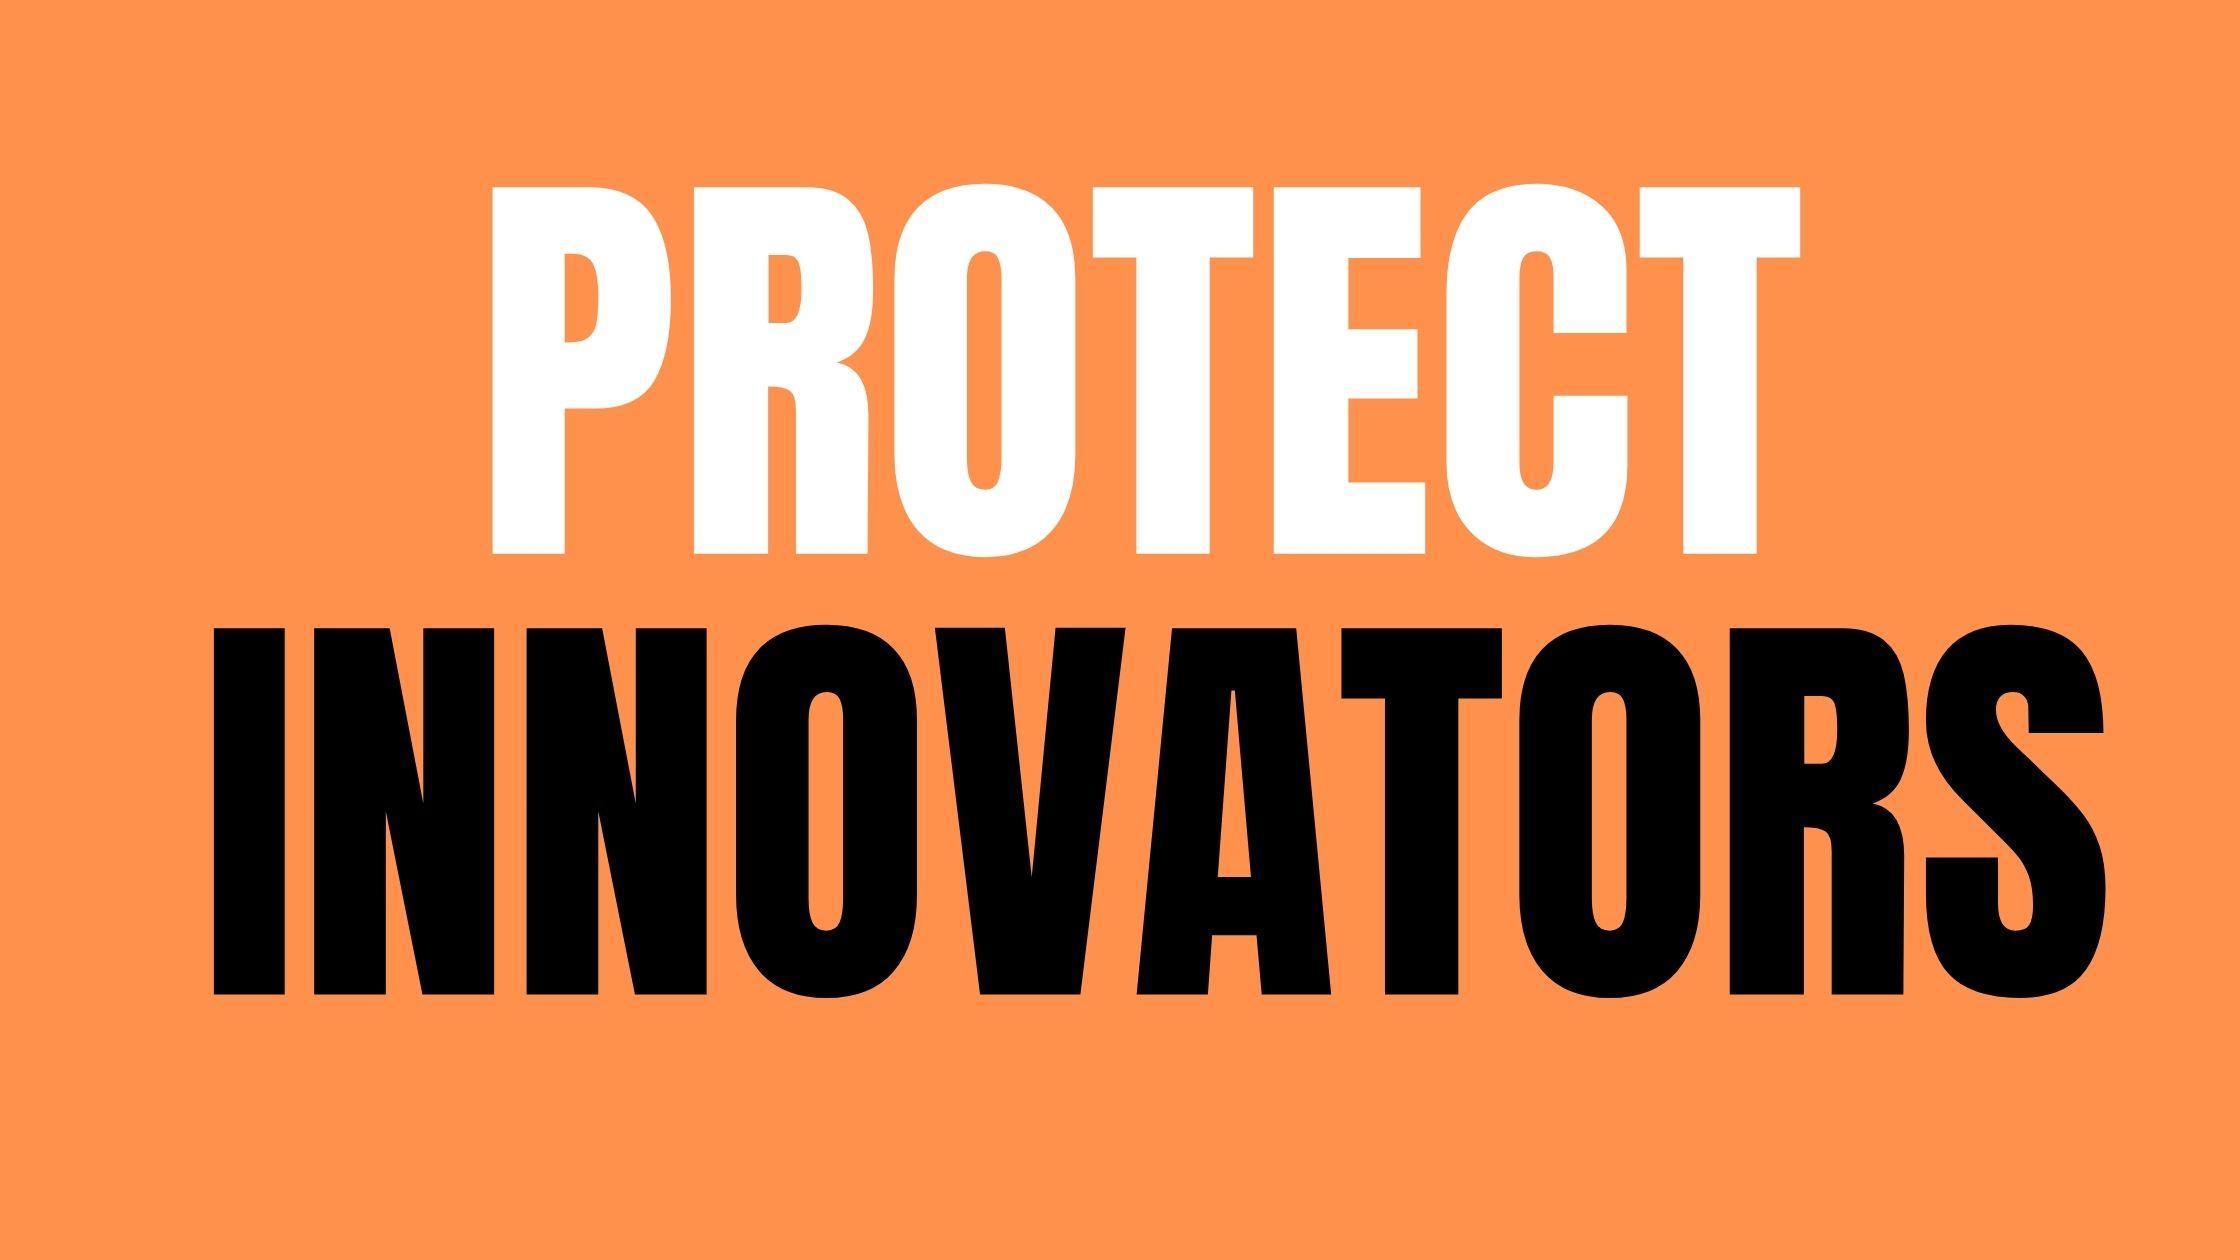 protect innovators